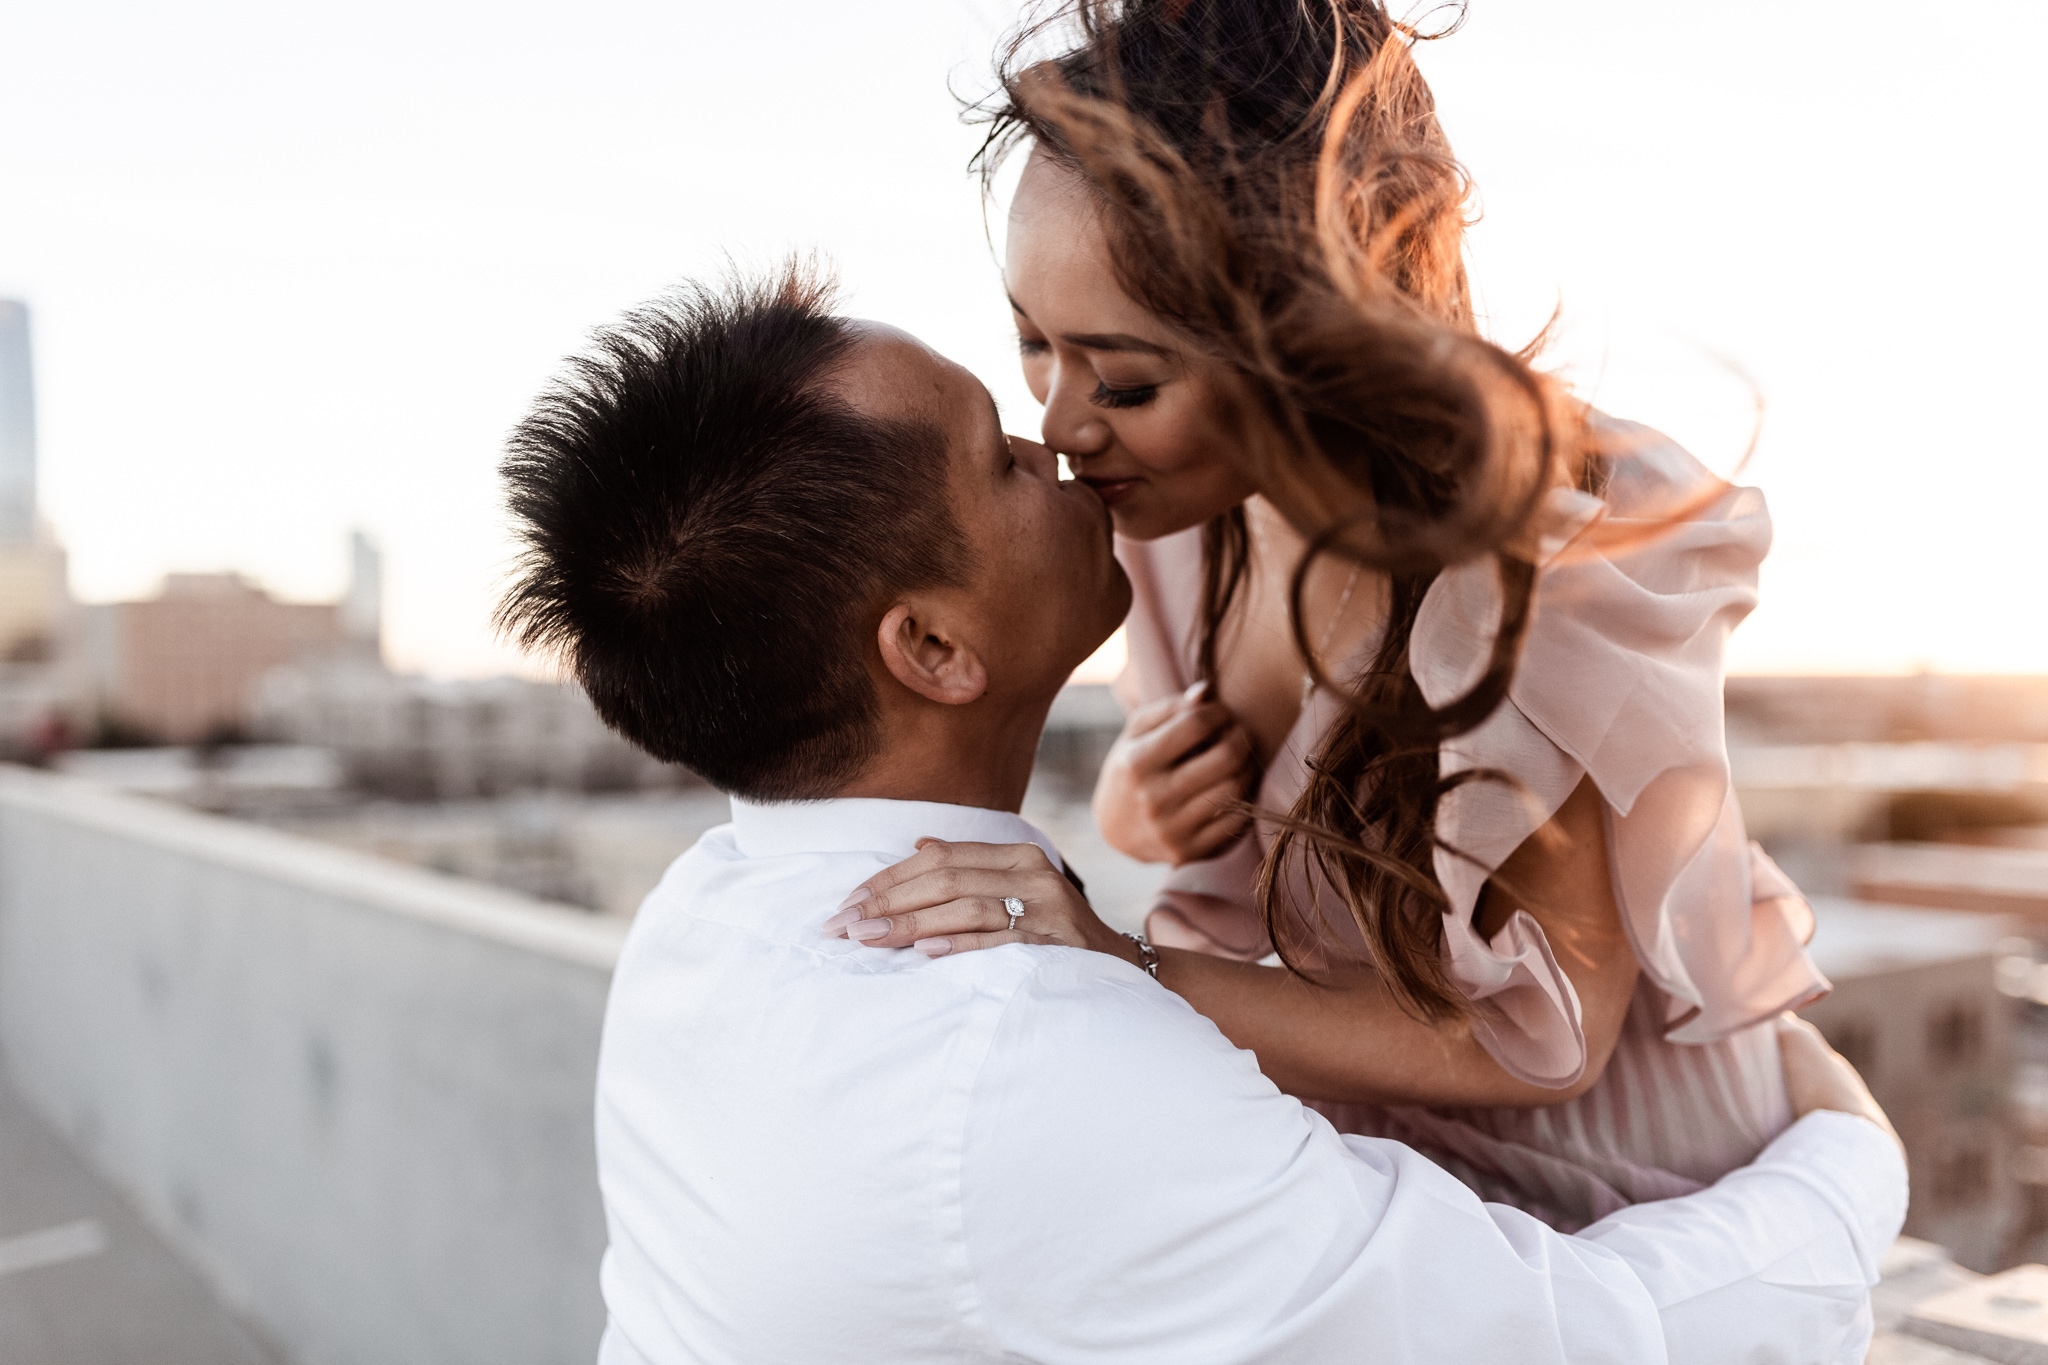 Hieu + Teresa | Colorful Romantic Downtown Engagements | Oklahoma Wedding Photographer-64.jpg